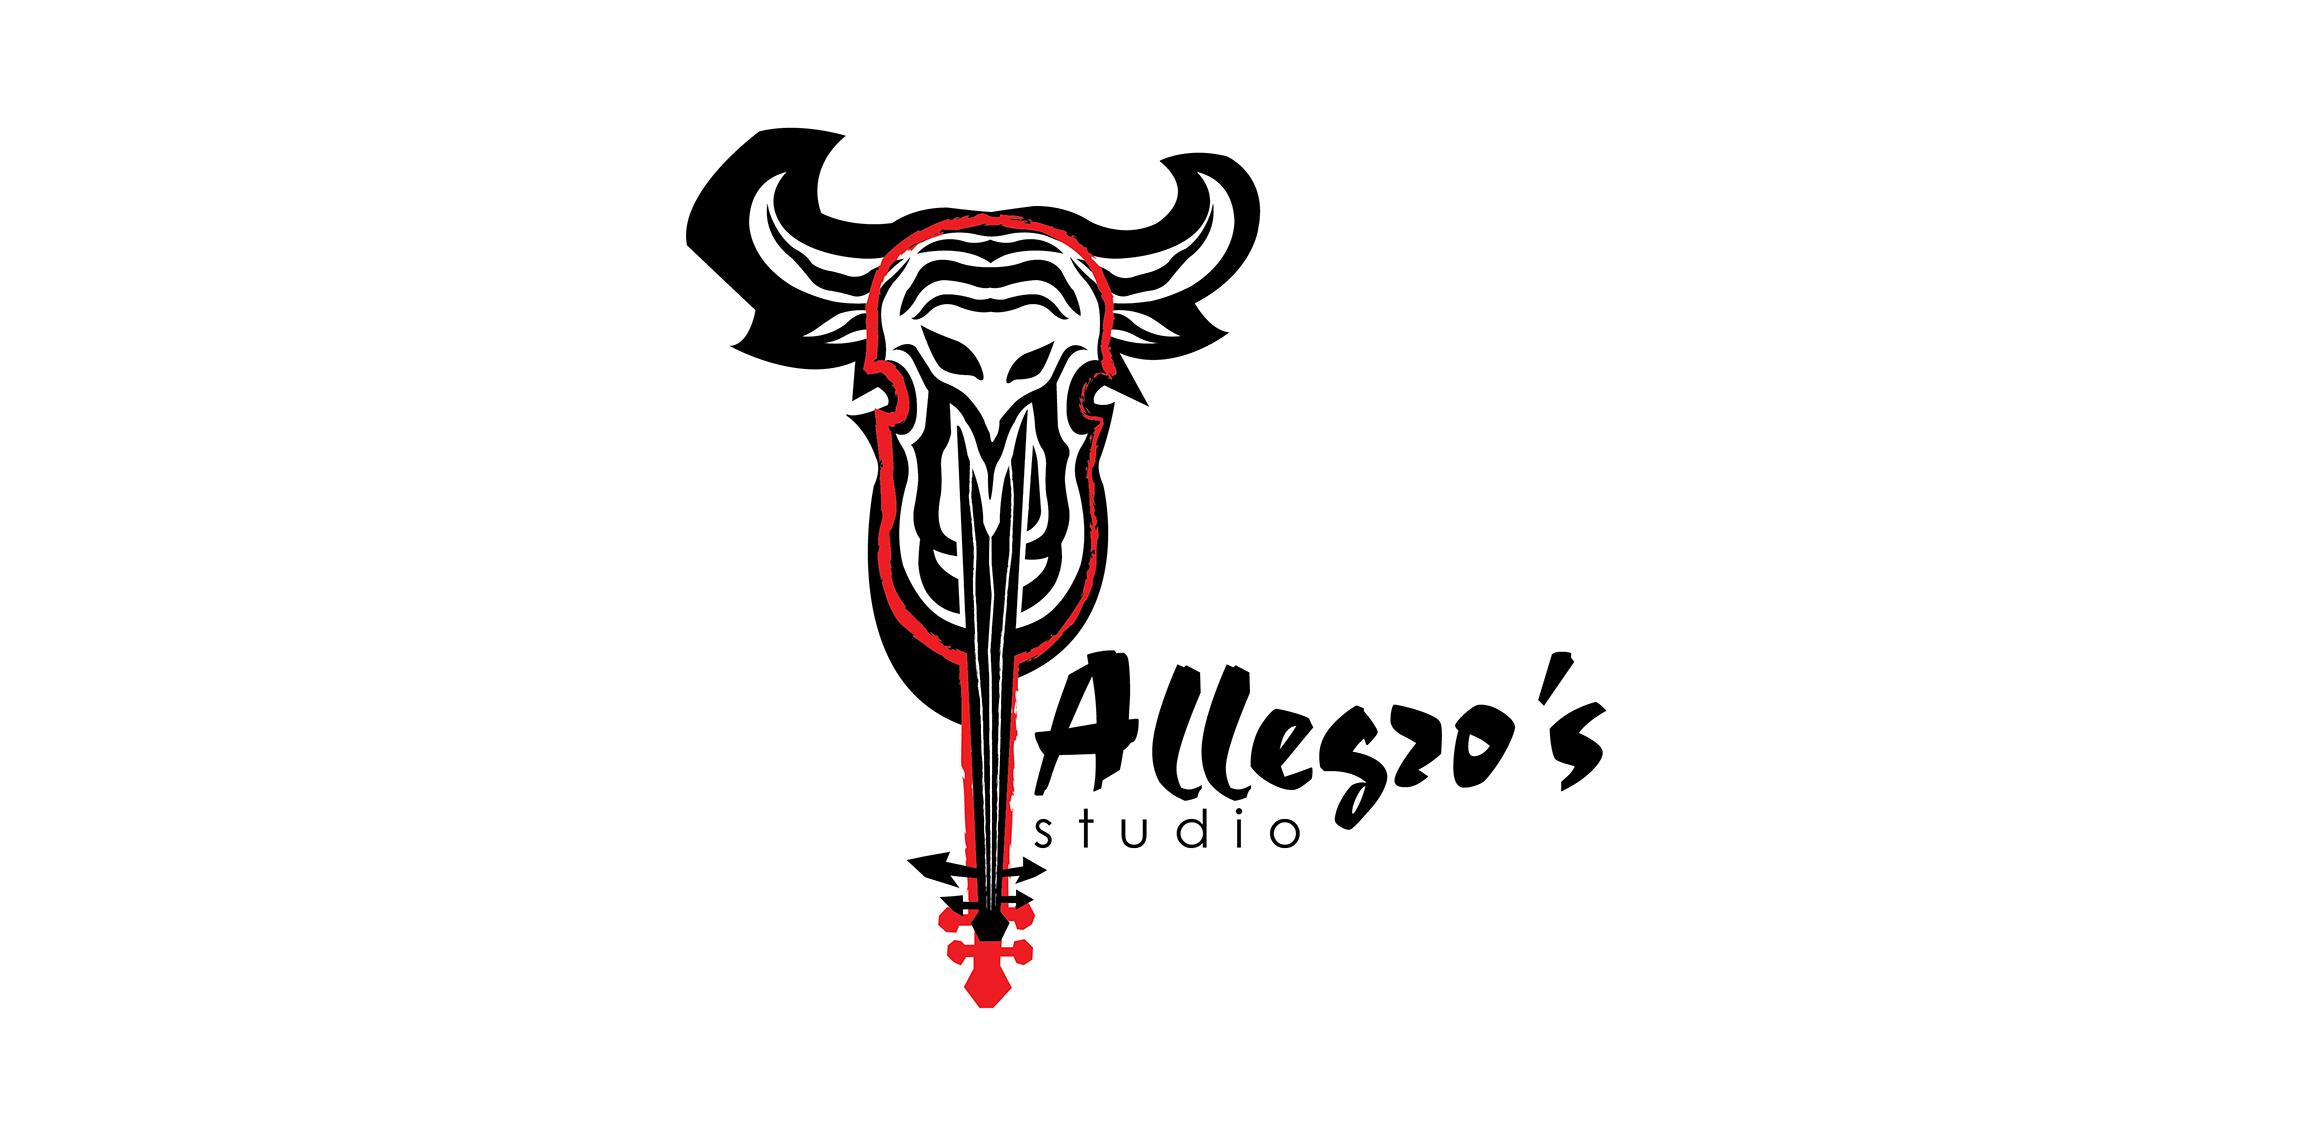 Allegro's Studio